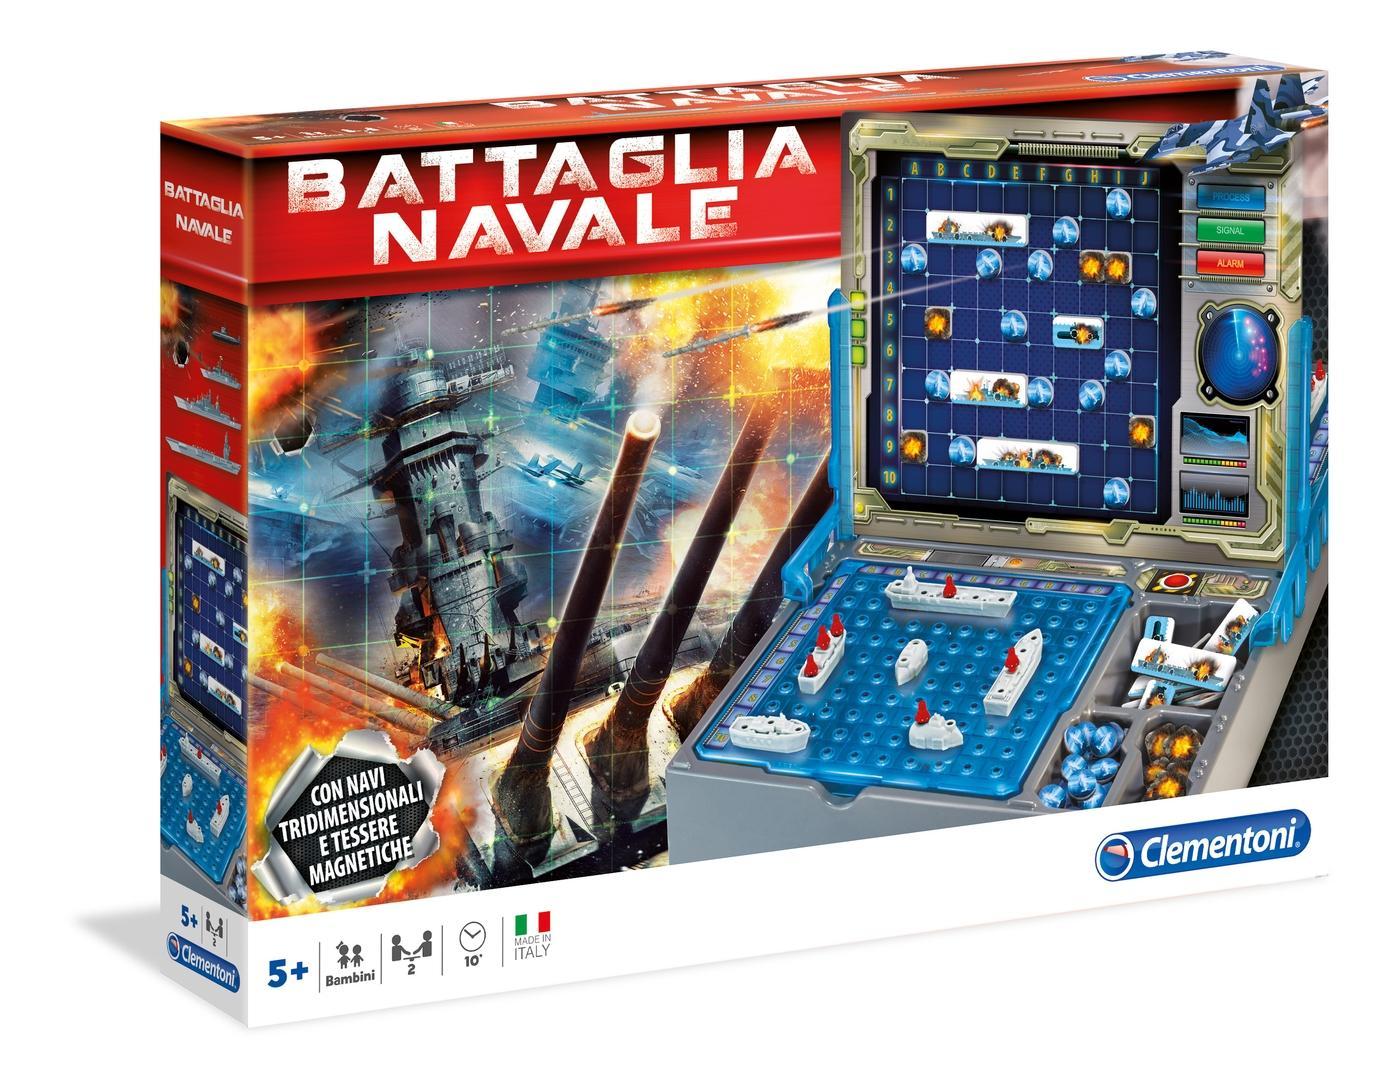 BATTAGLIA NAVALE 11133 CLEMENTONI